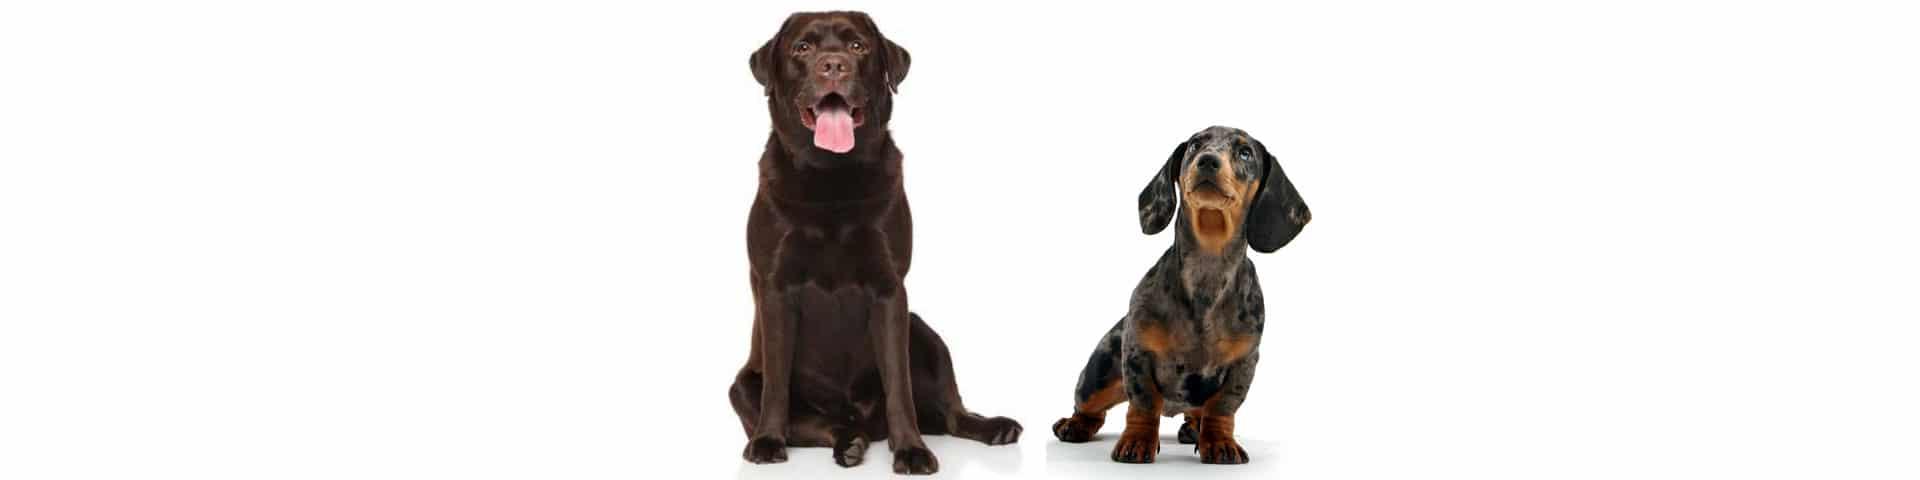 Labrador and Dachshund